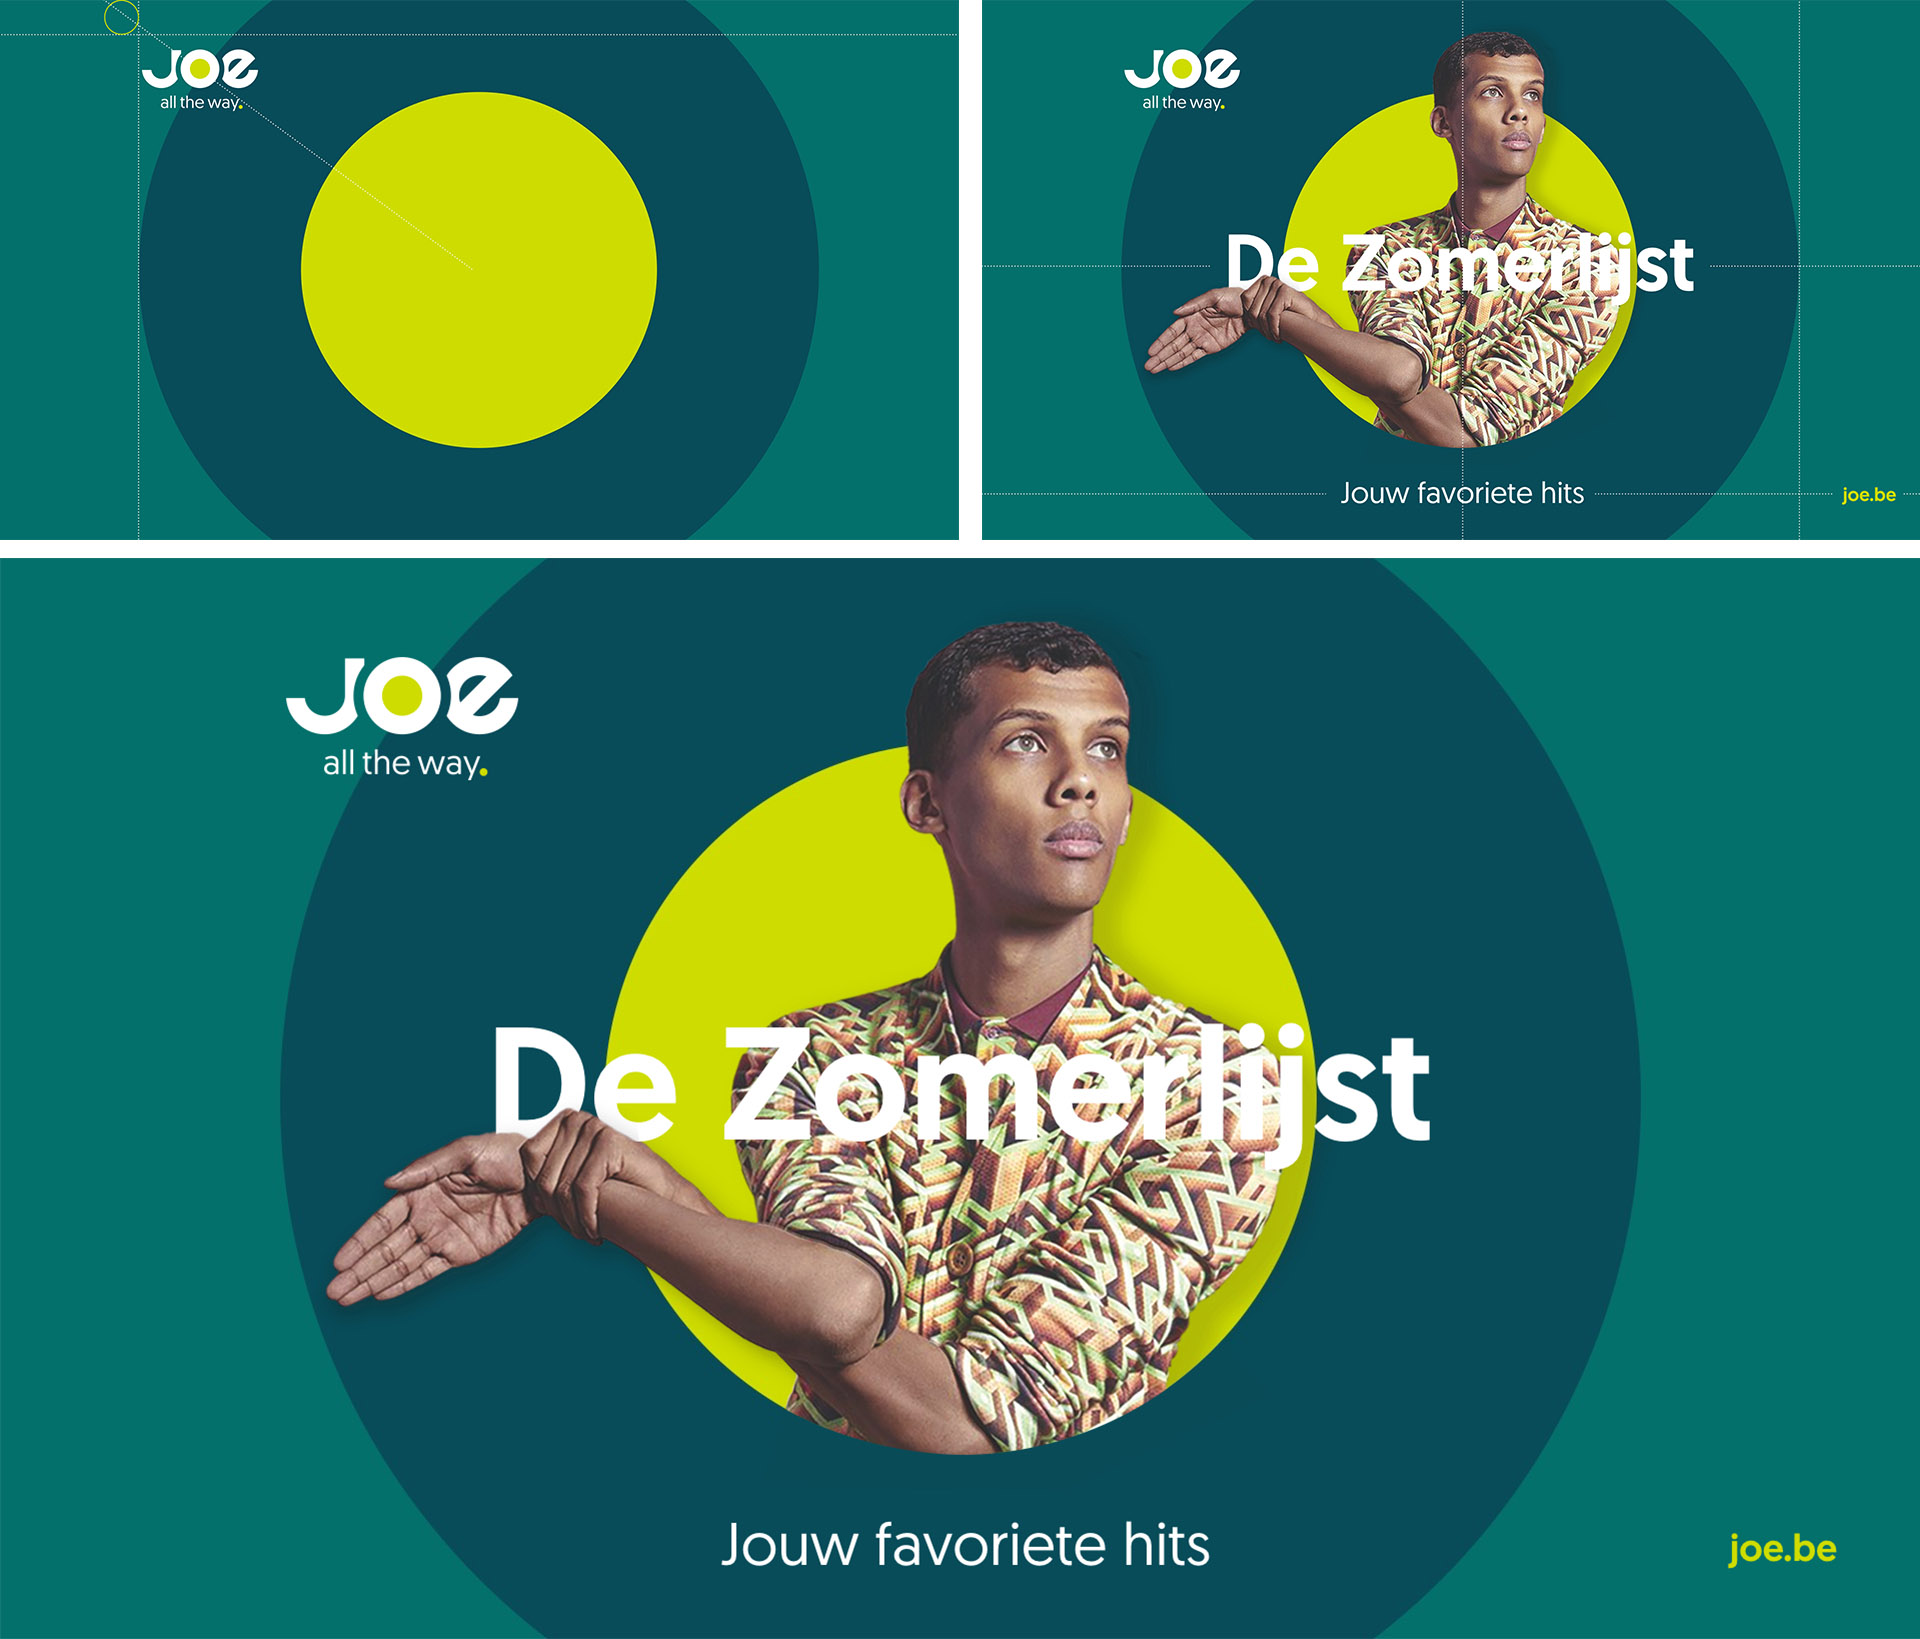 Medialaan Joe Identity Design logo system joe.be